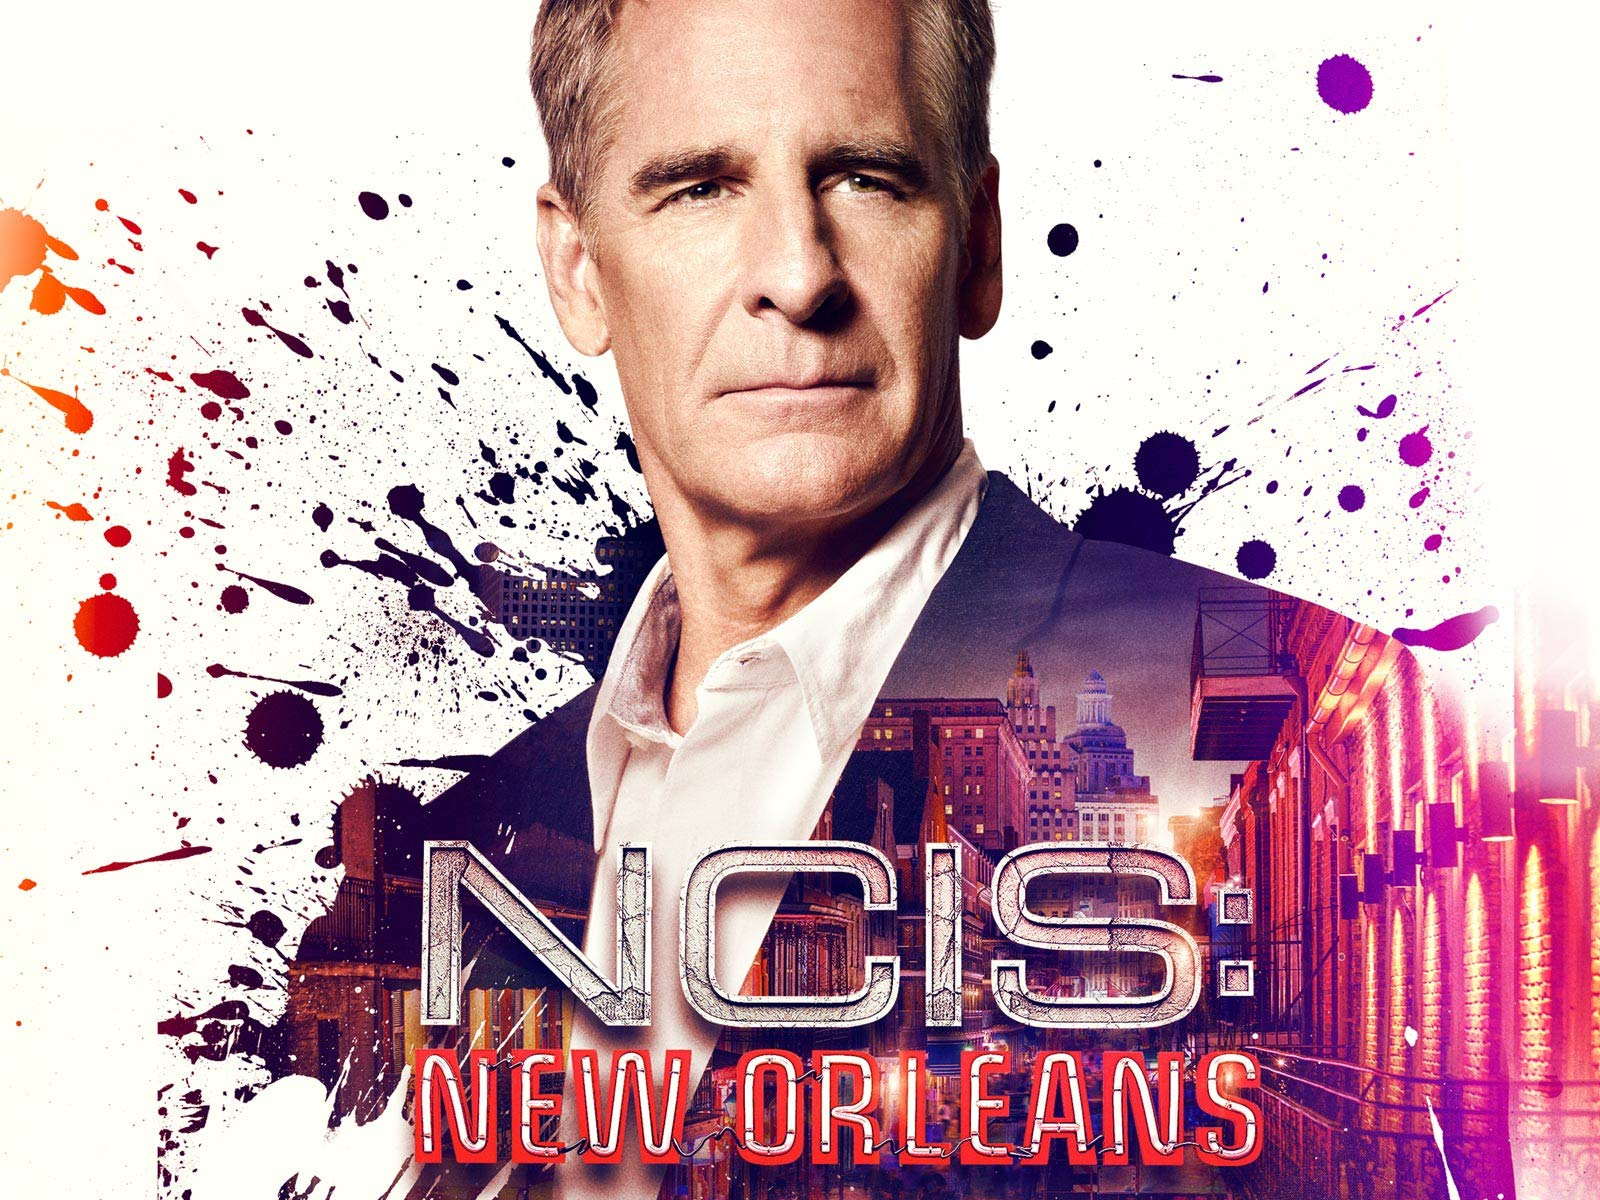 ncis new orleans season 5 episode 3 online